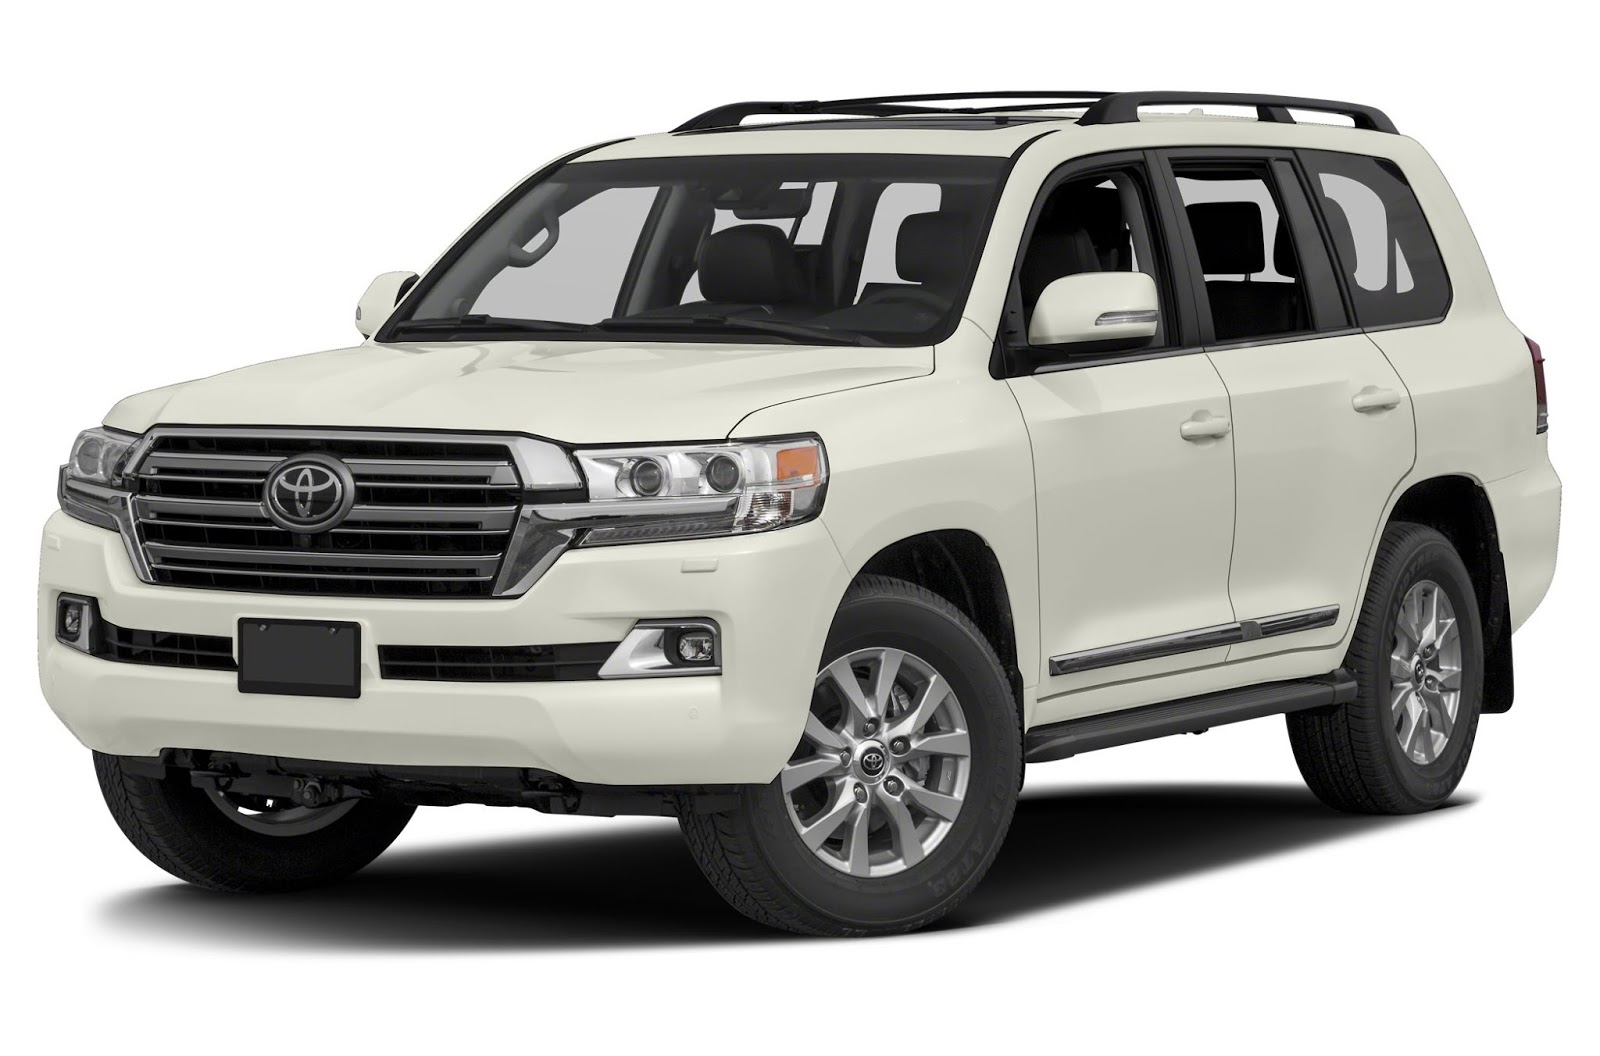 Kelebihan Kekurangan Harga Toyota Land Cruiser Murah Berkualitas